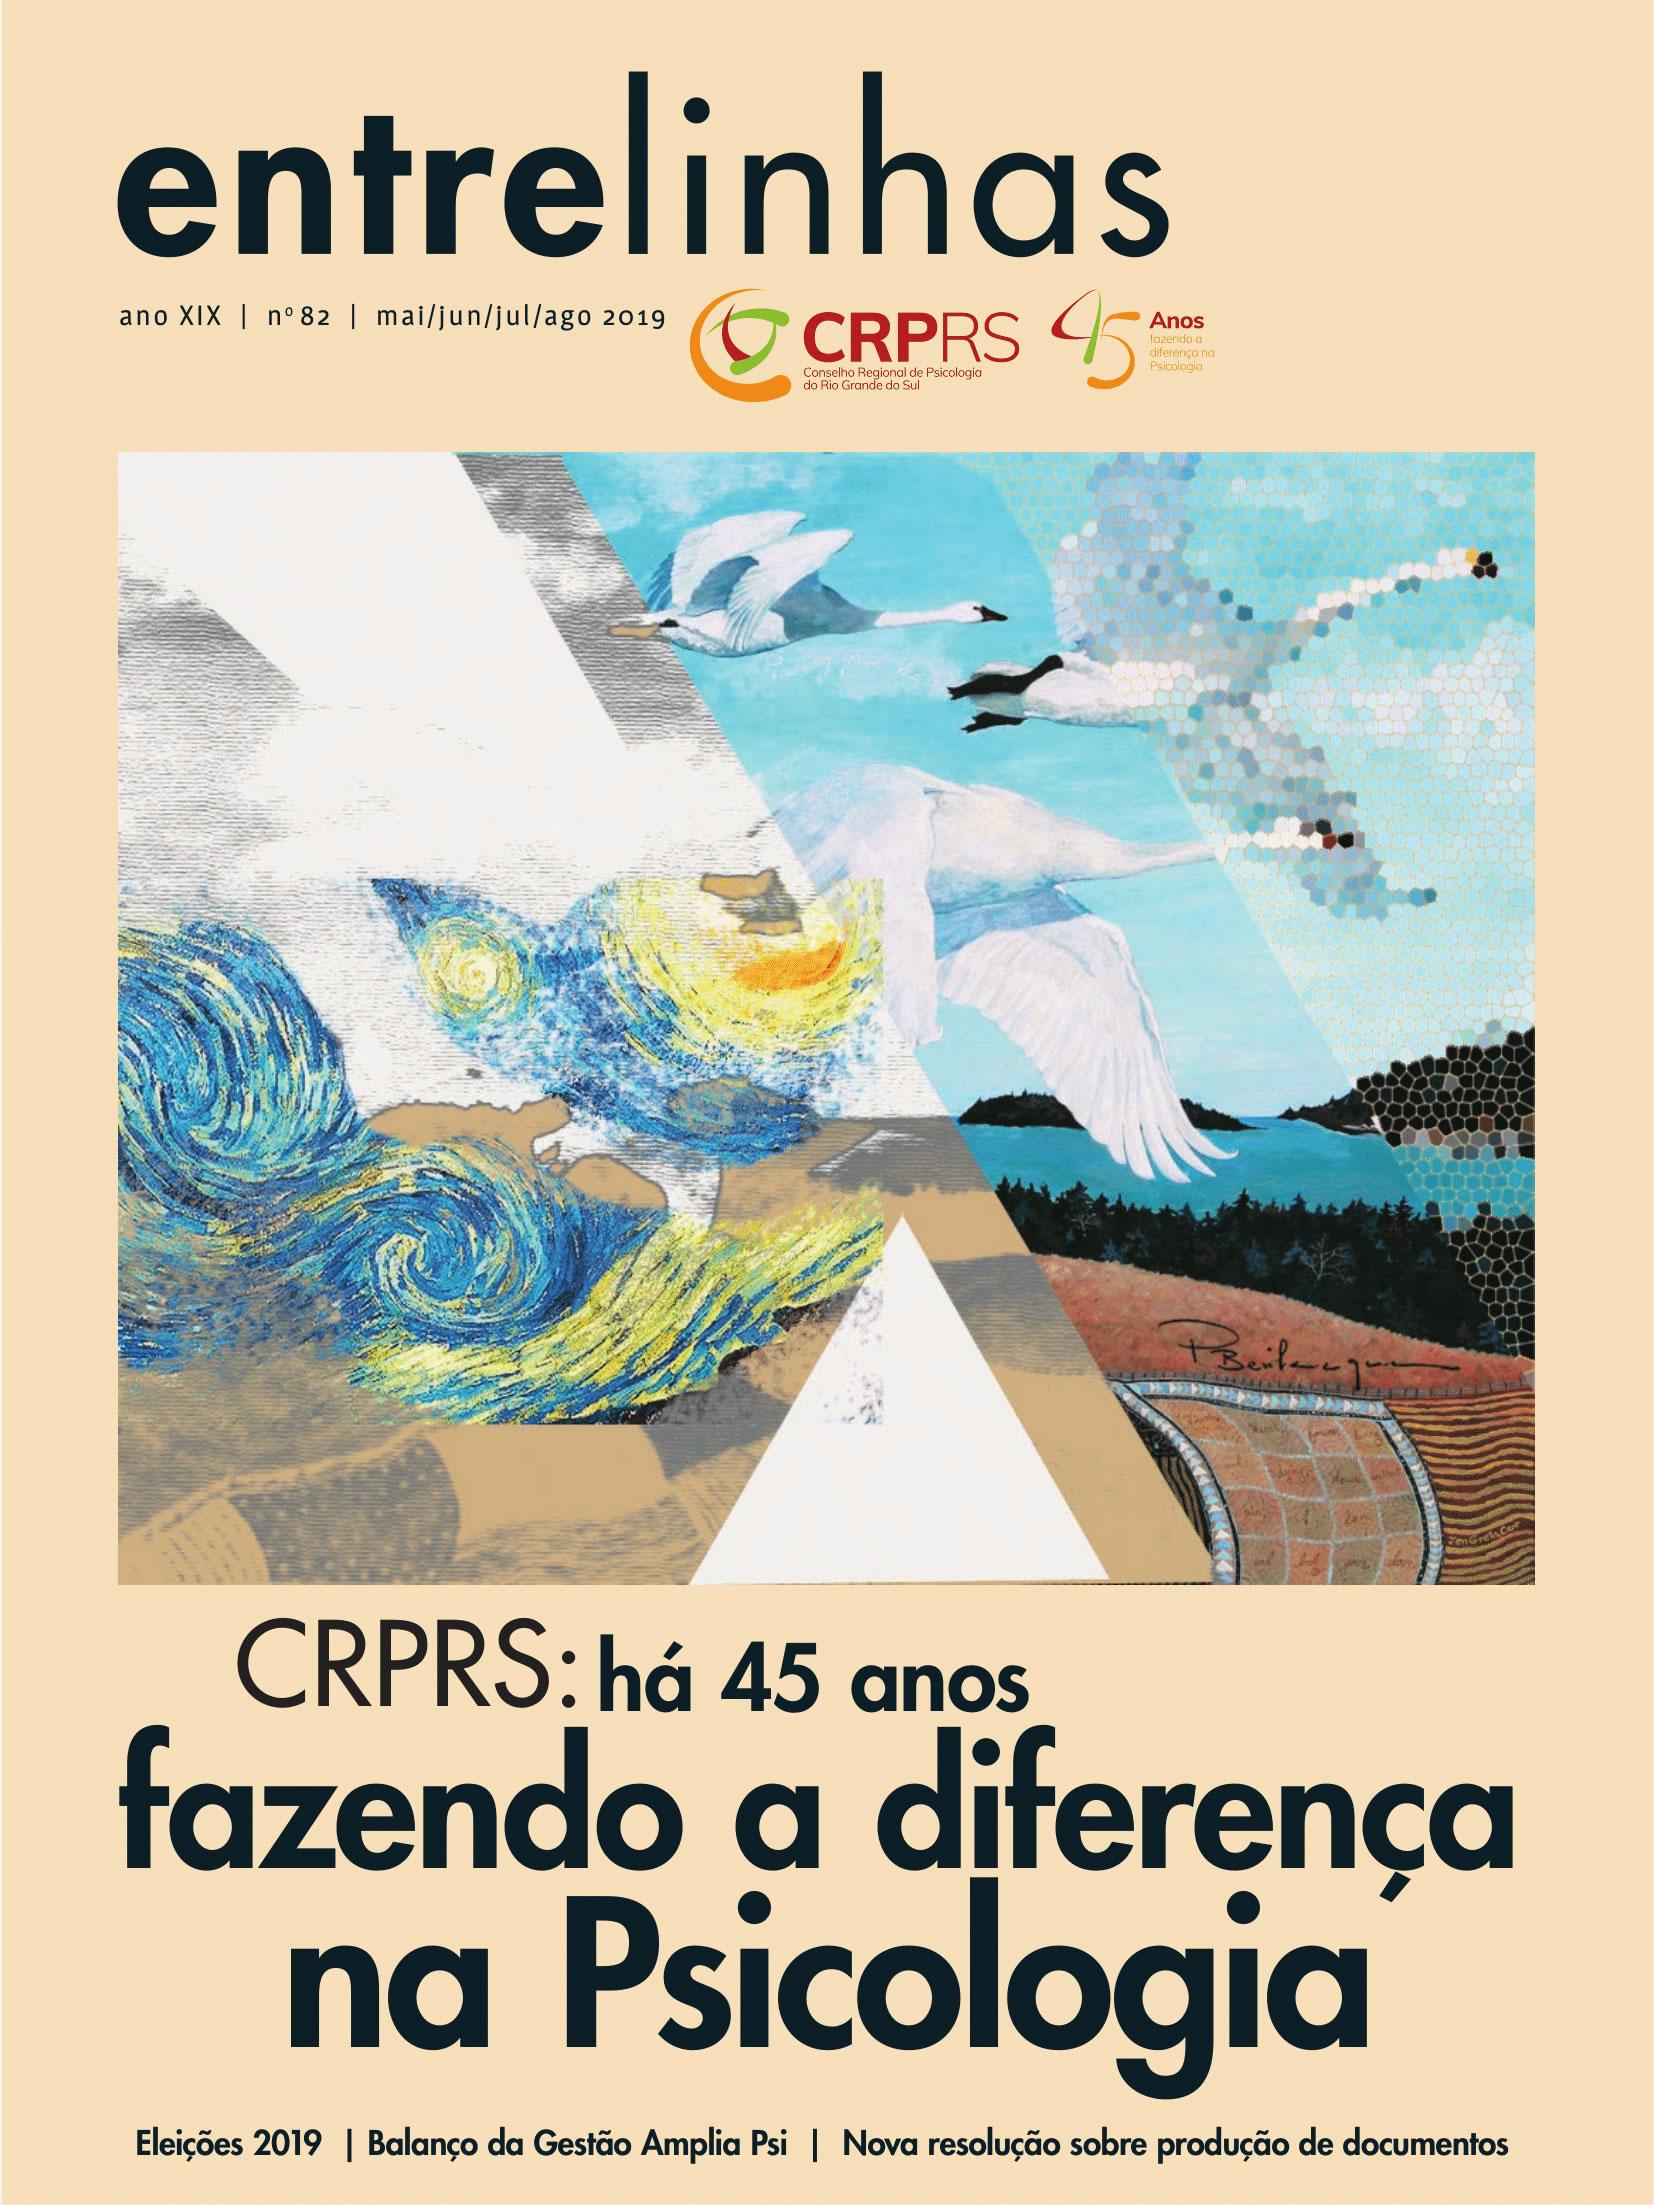 CRPRS: há 45 anos fazendo a diferença na Psicologia